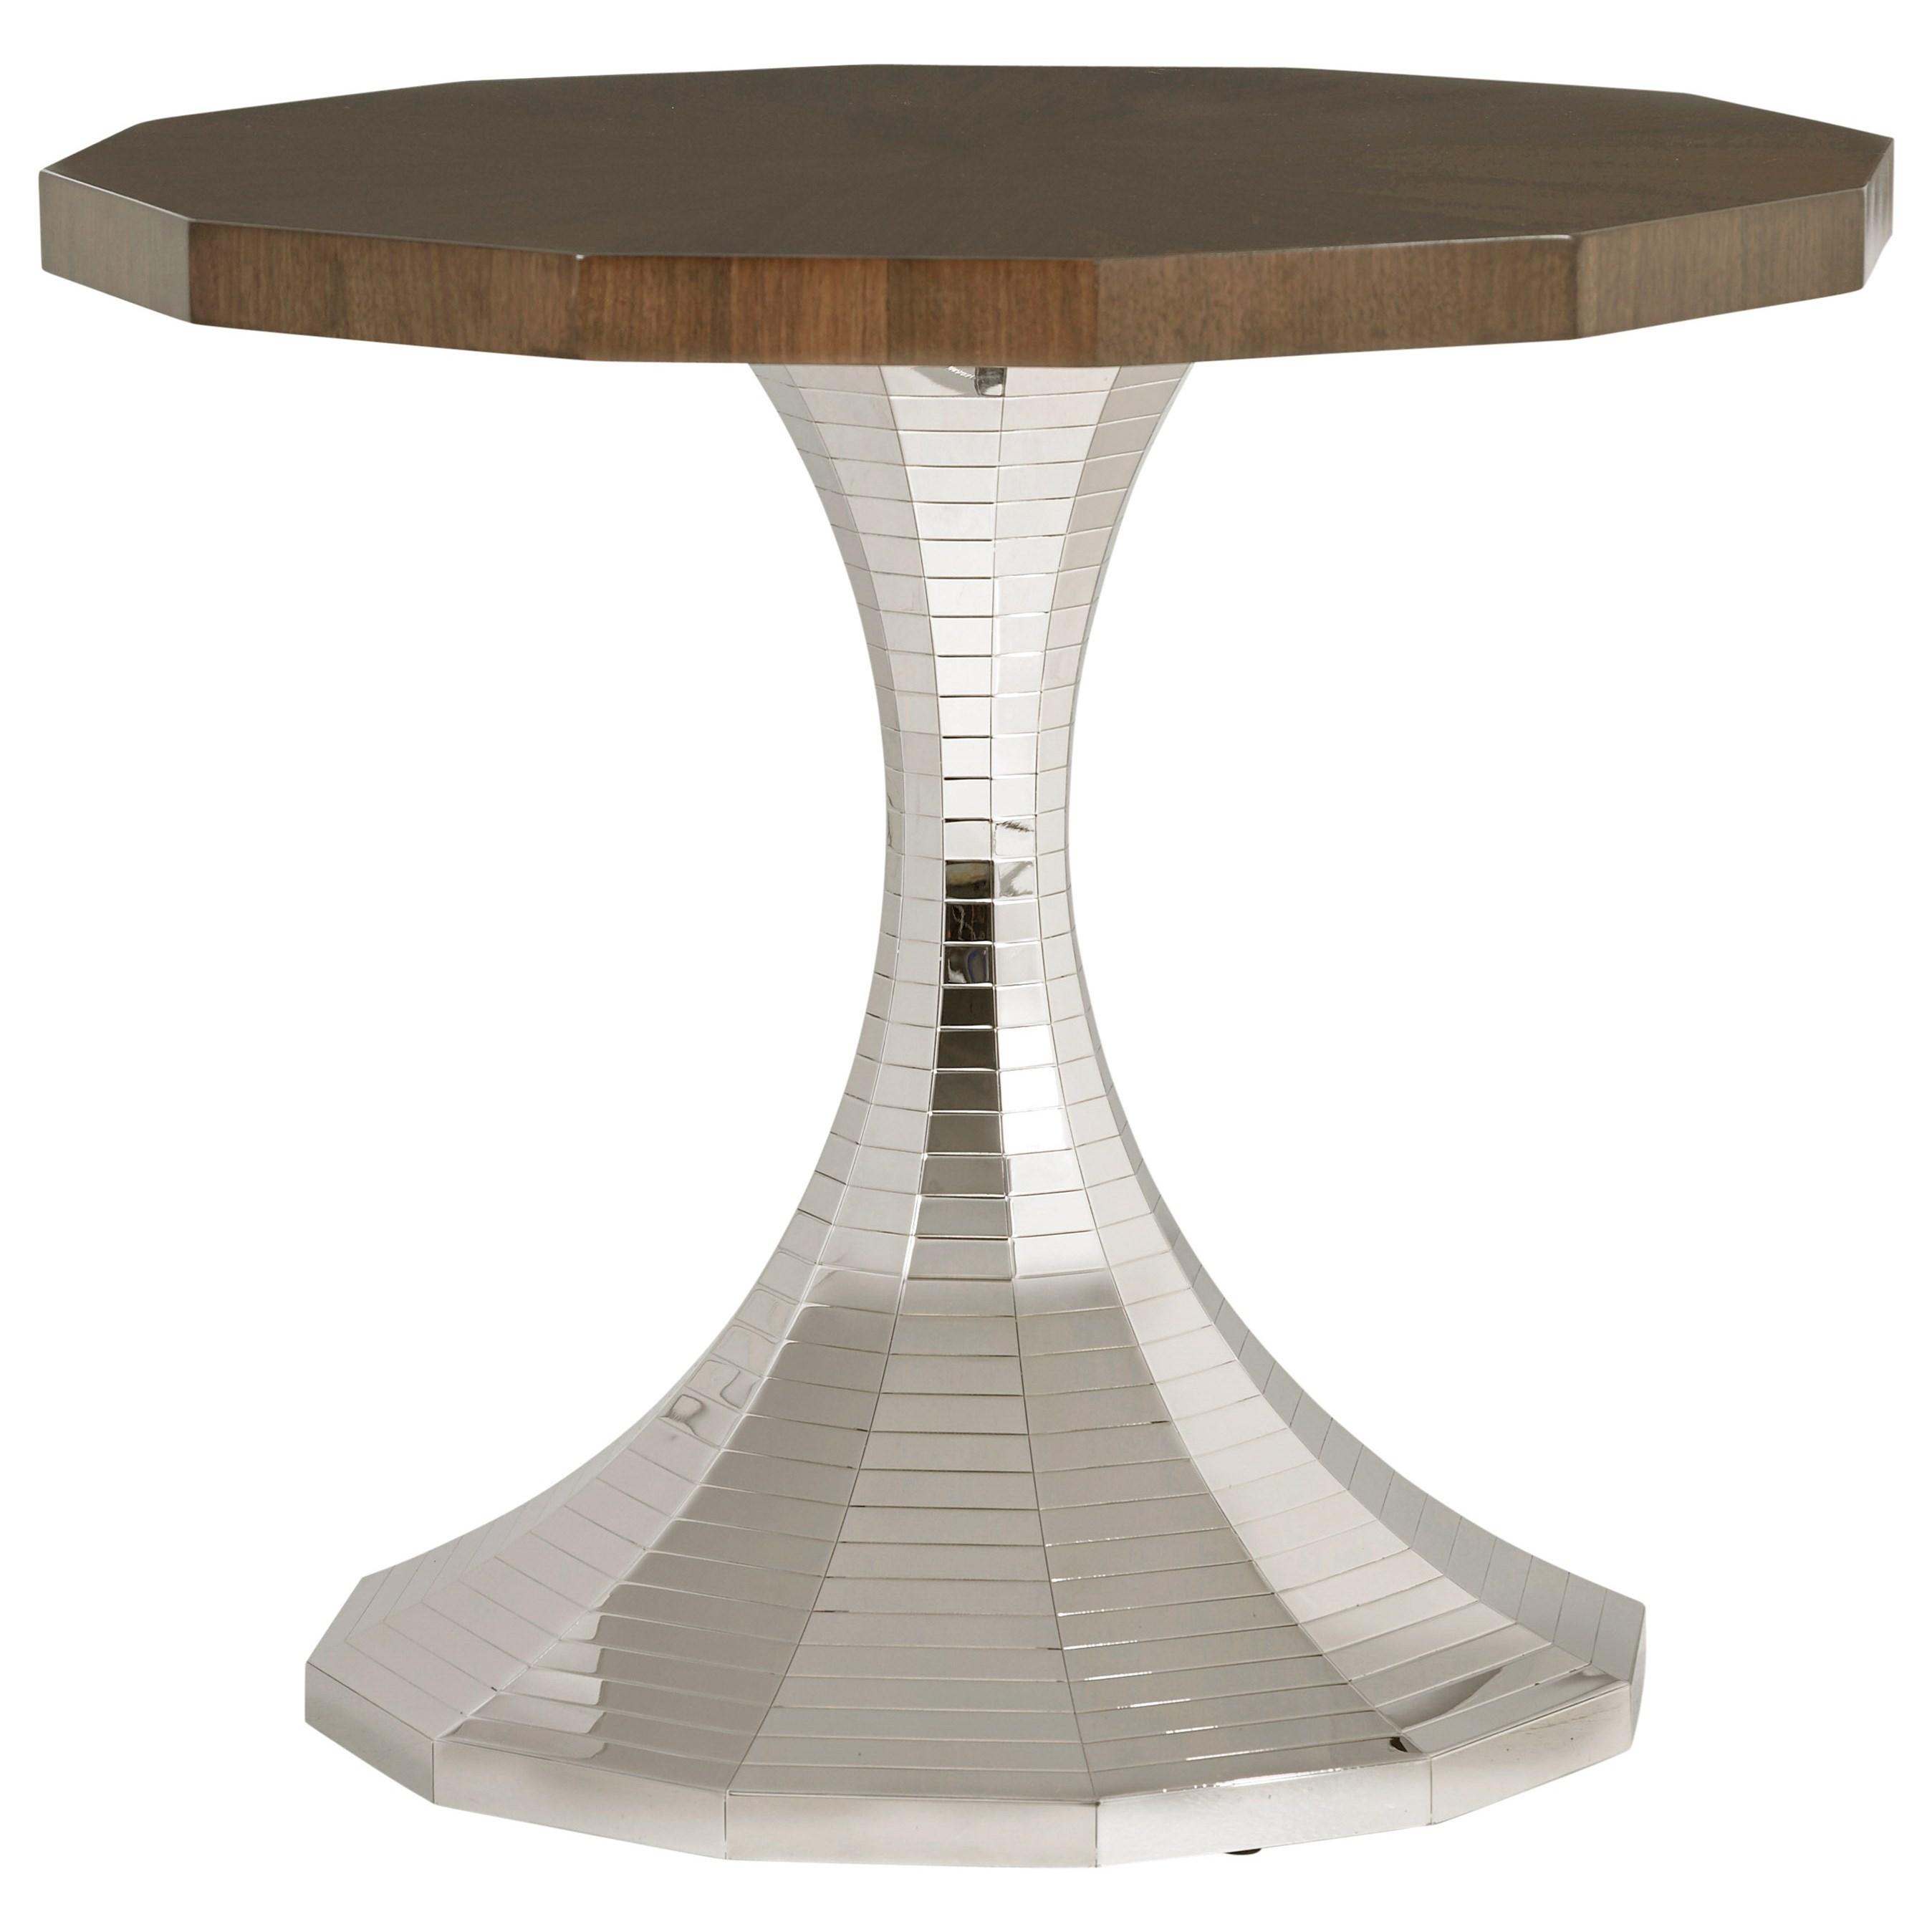 MacArthur Park Hermosa Center Table by Lexington at Baer's Furniture